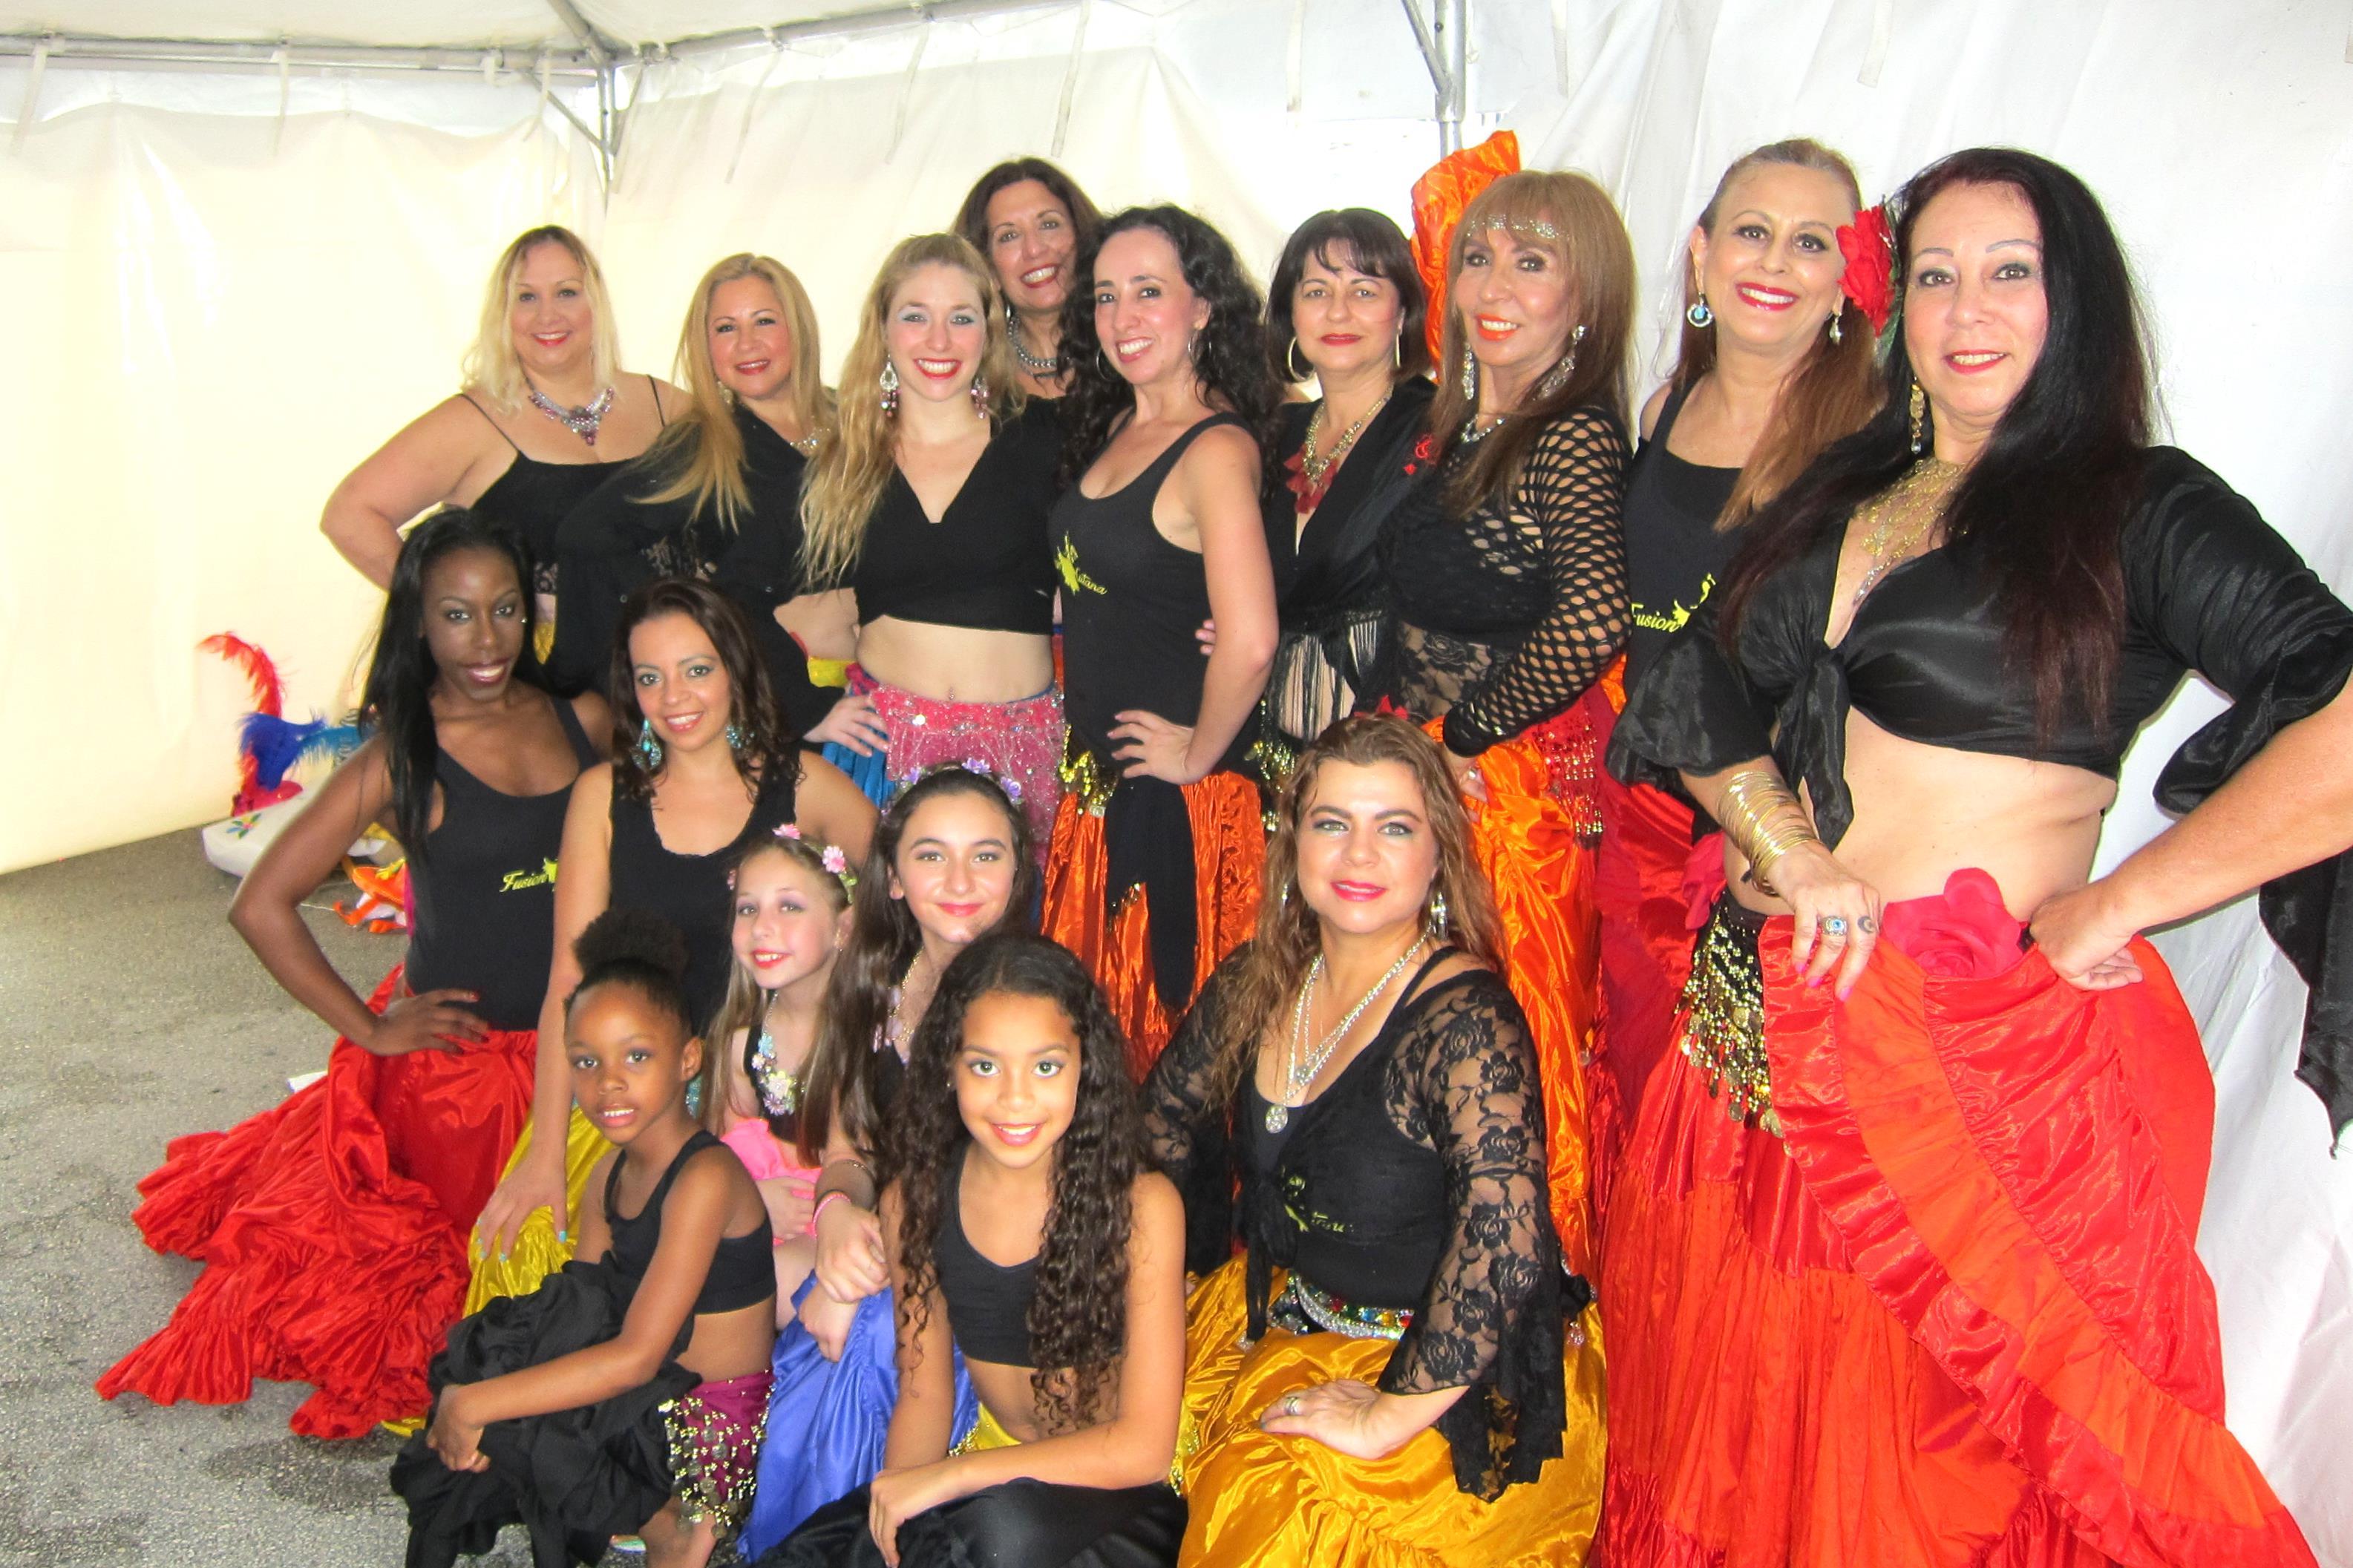 Festival Coral Gables